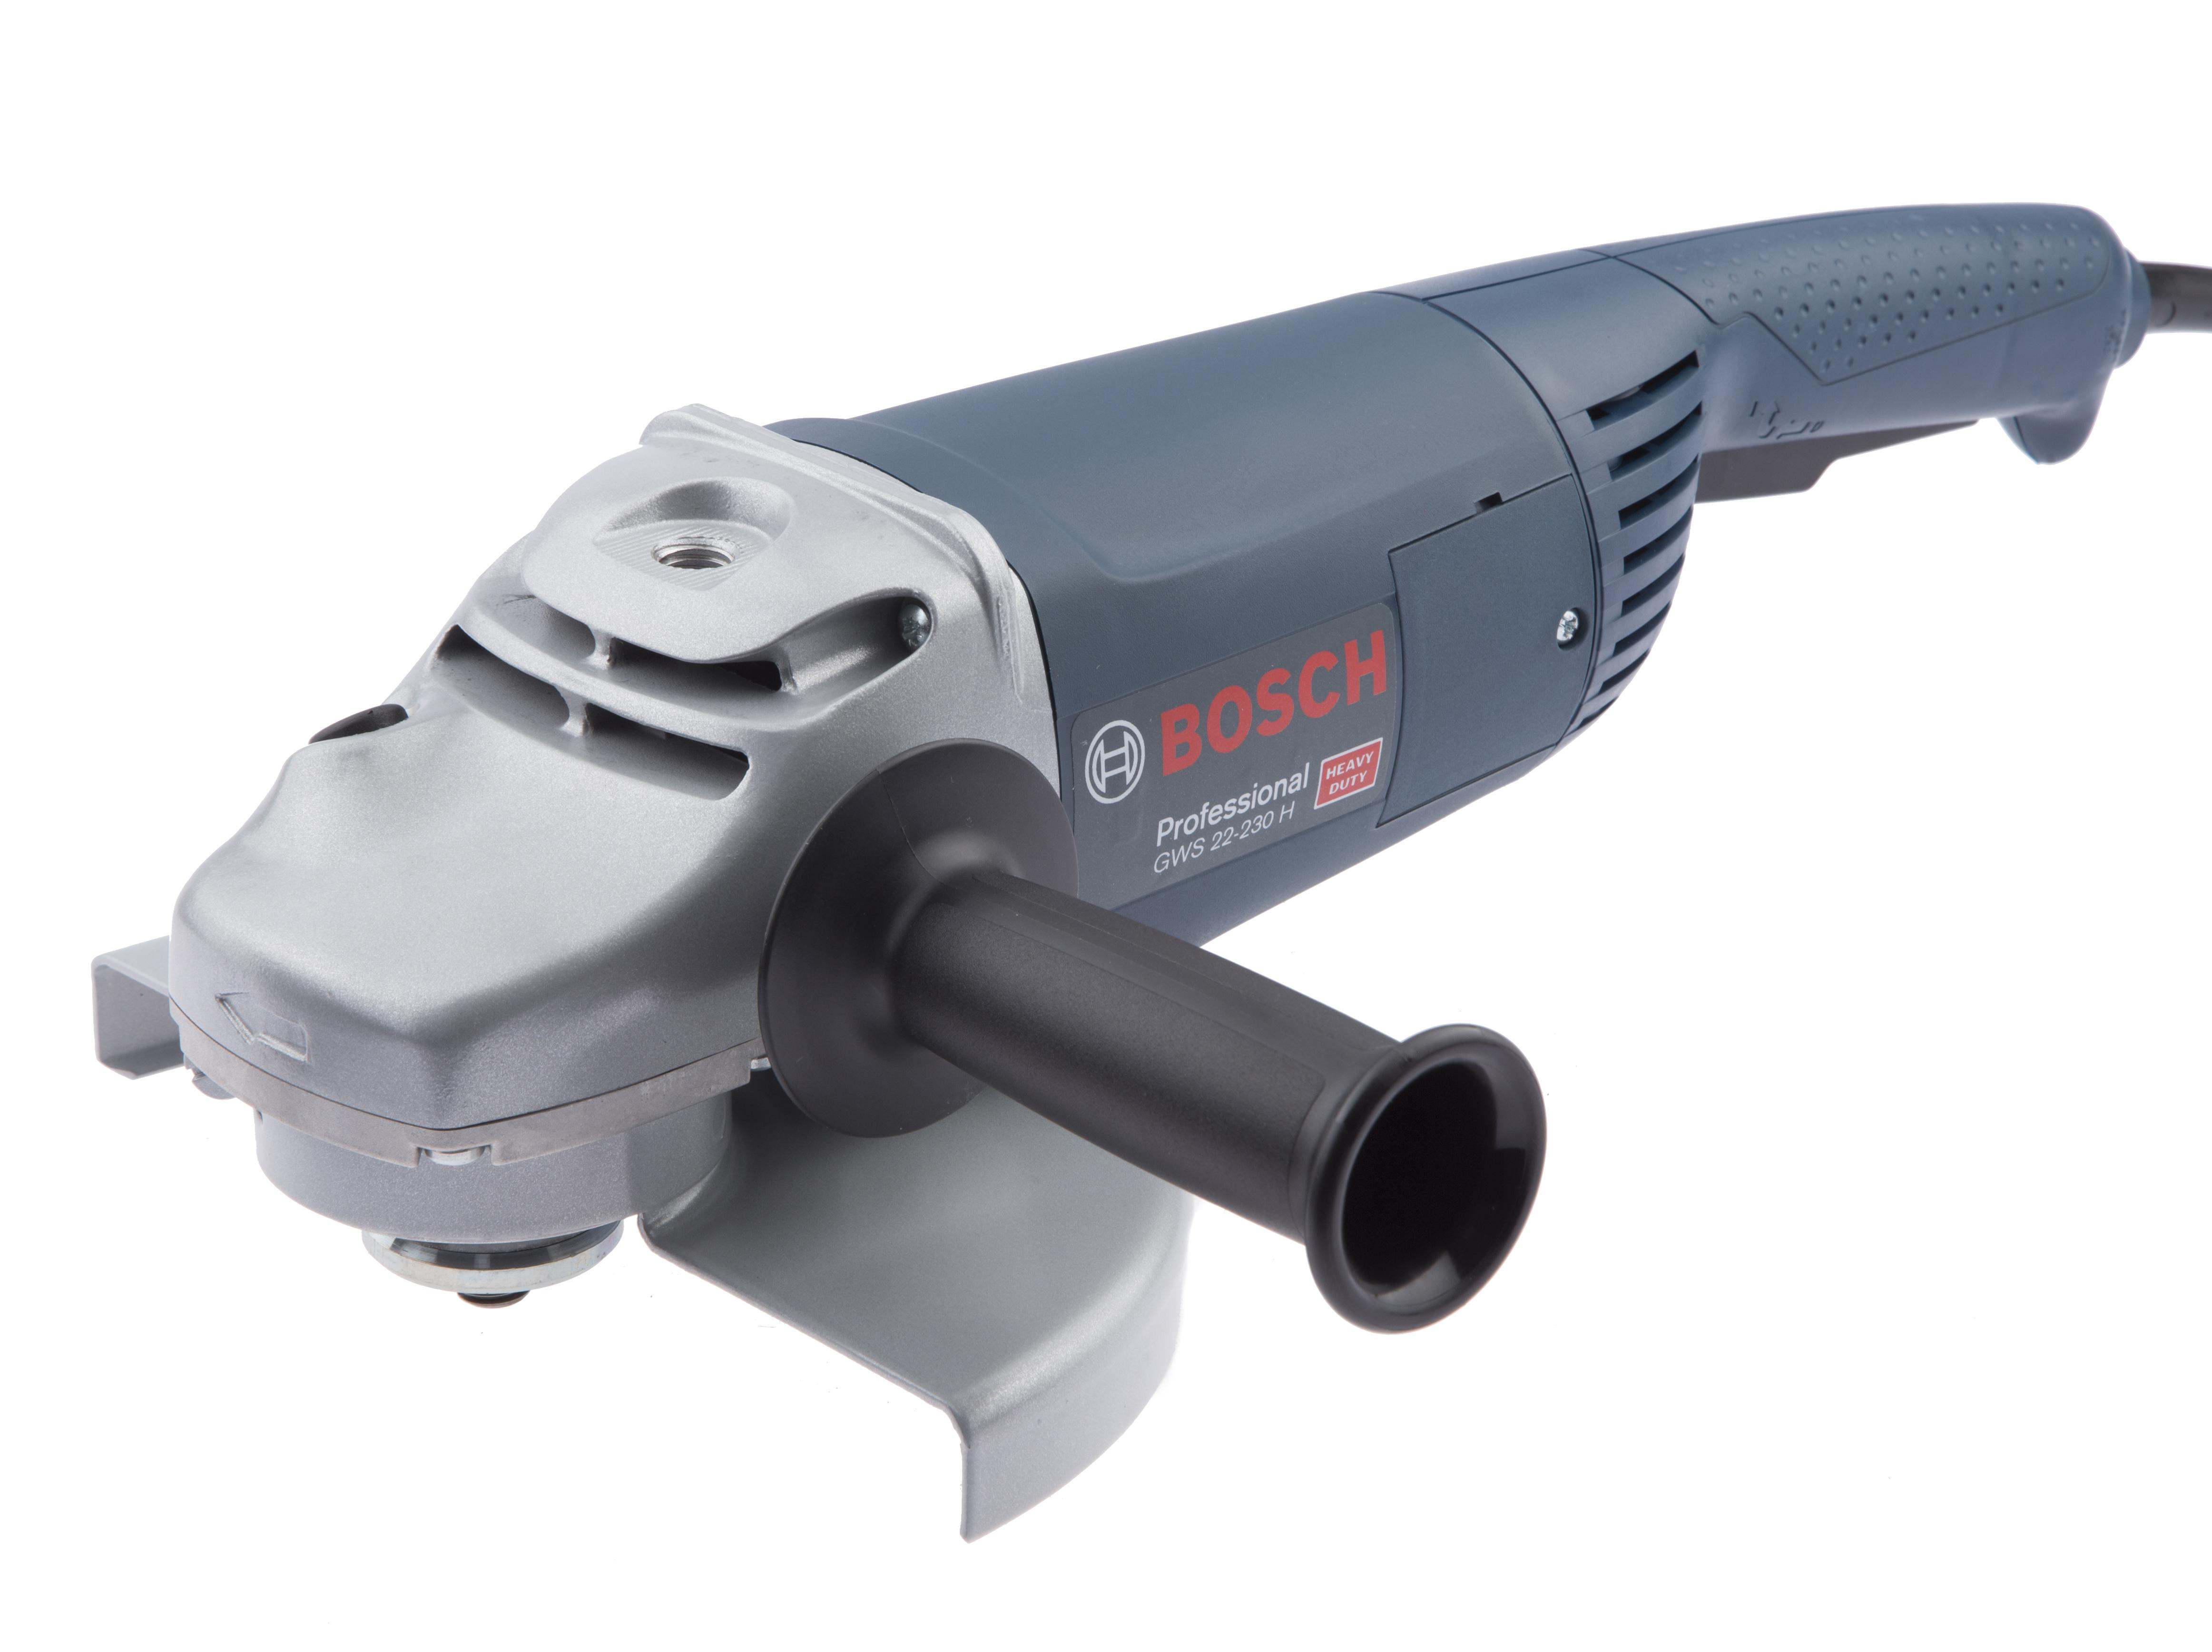 УШМ (болгарка) Bosch Gws 22-230 h (0.601.882.103) угловая шлифовальная машина bosch gws 20 230 h 0 601 850 107